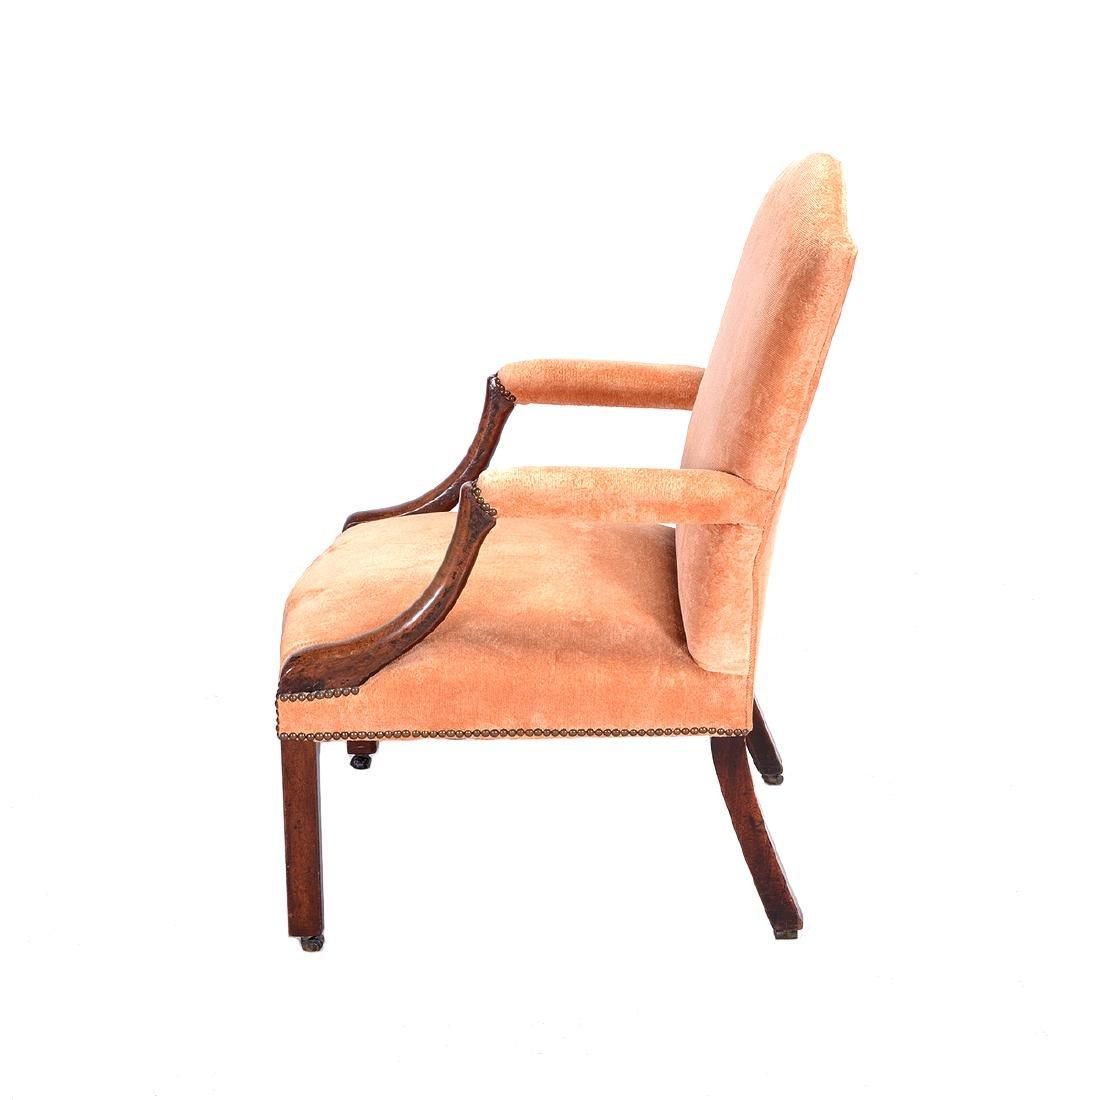 George III Mahogany Upholstered Open Armchair - 5